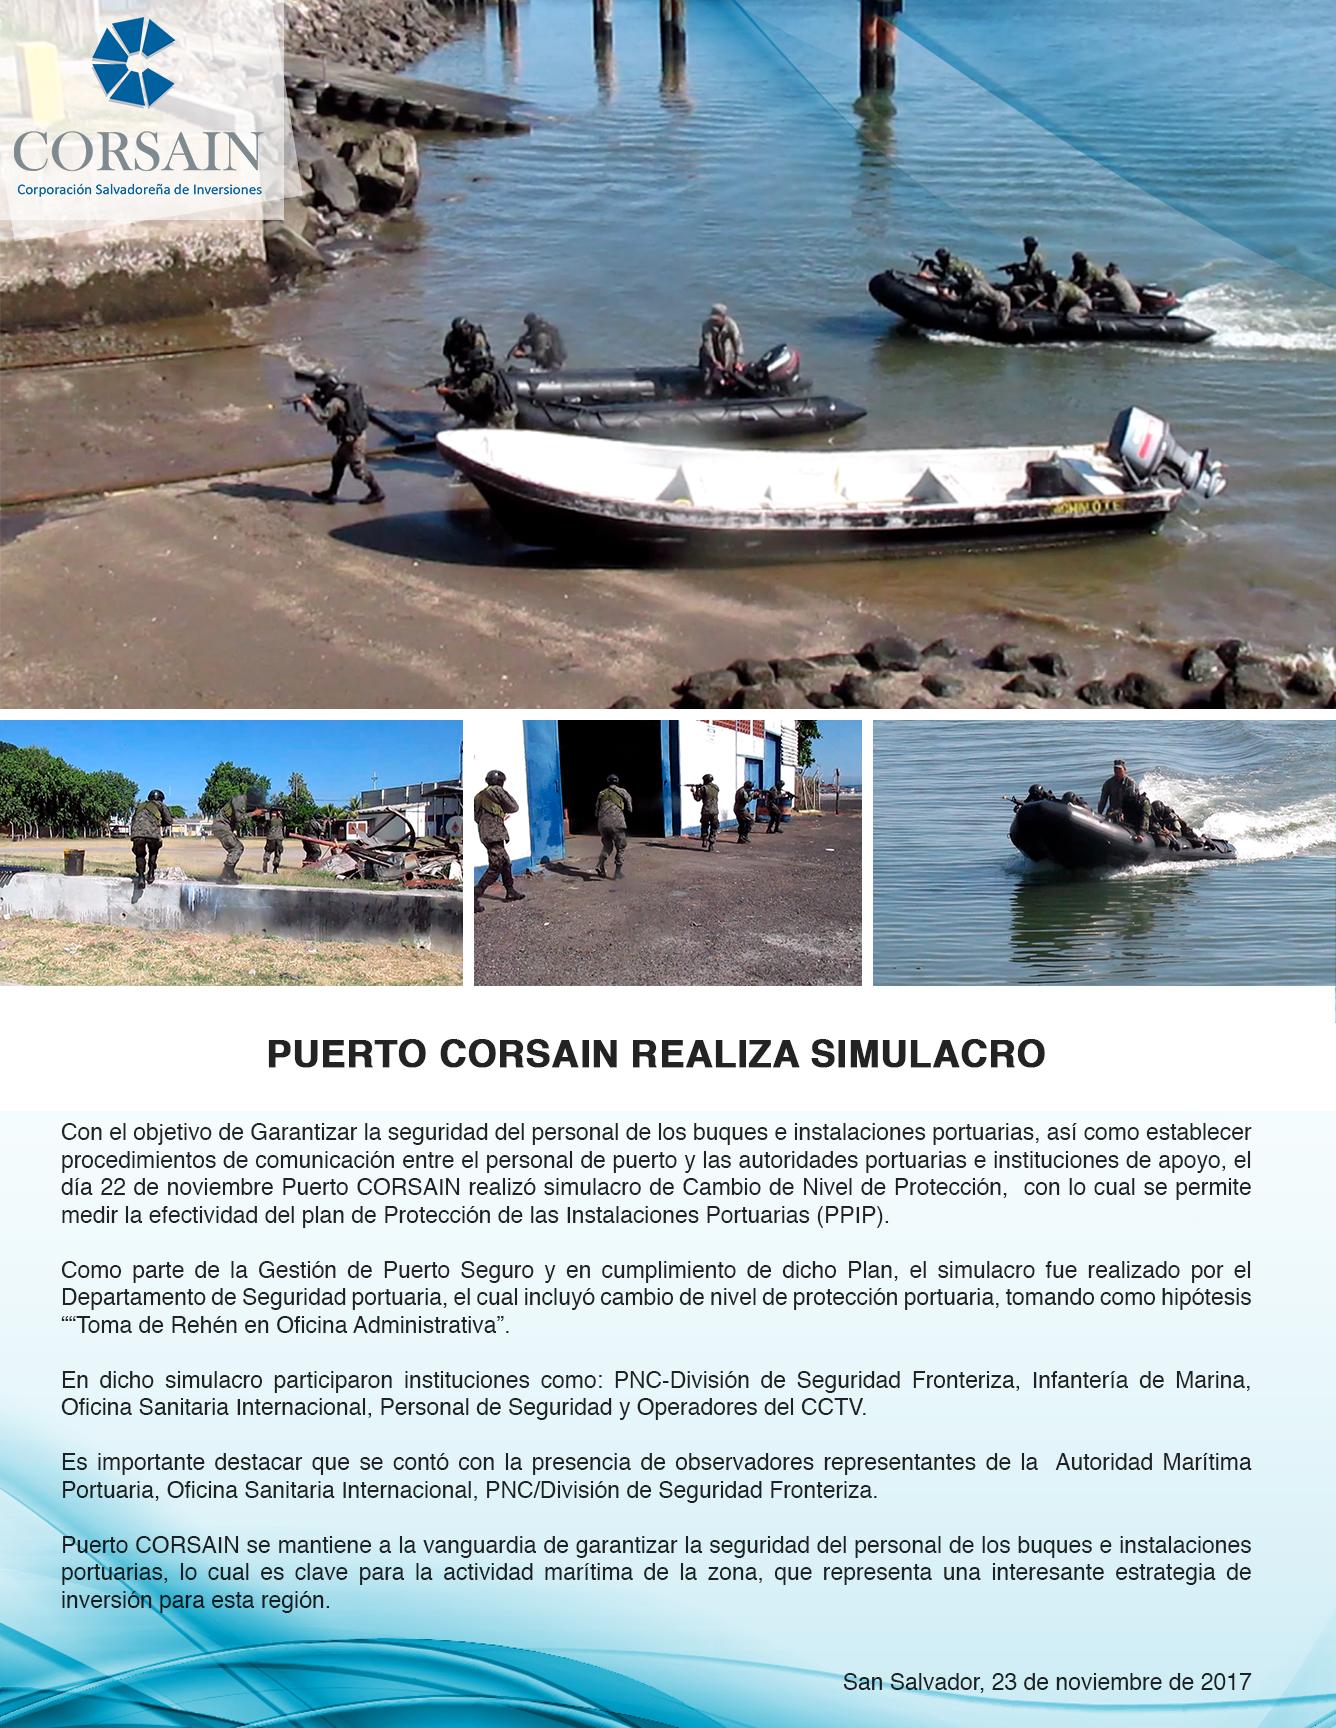 puerto-corsain-realiza-simulacro